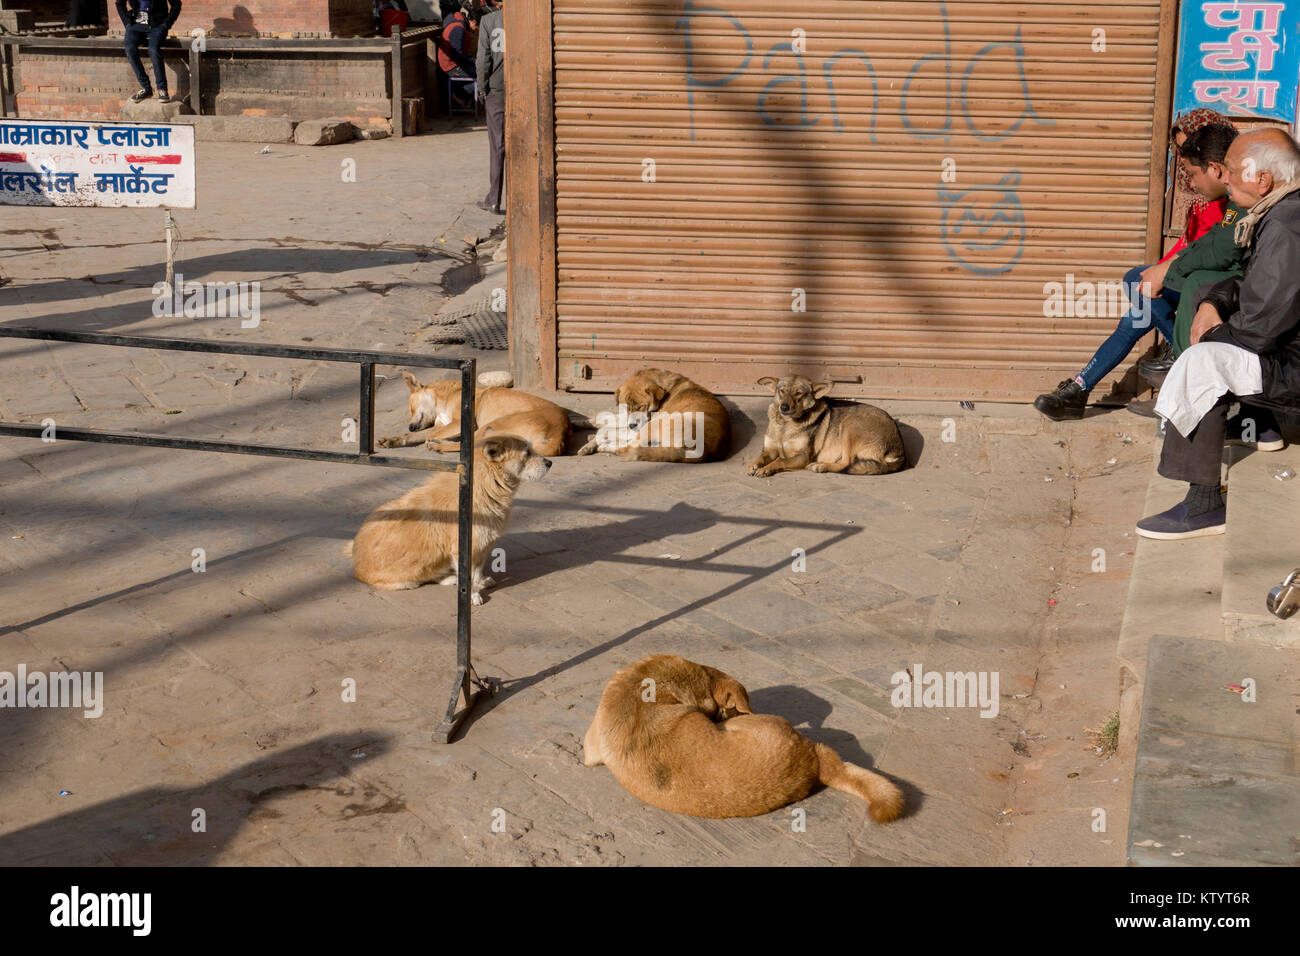 Street dogs snoozing in the sun in Kathmandu, Nepal Stock Photo